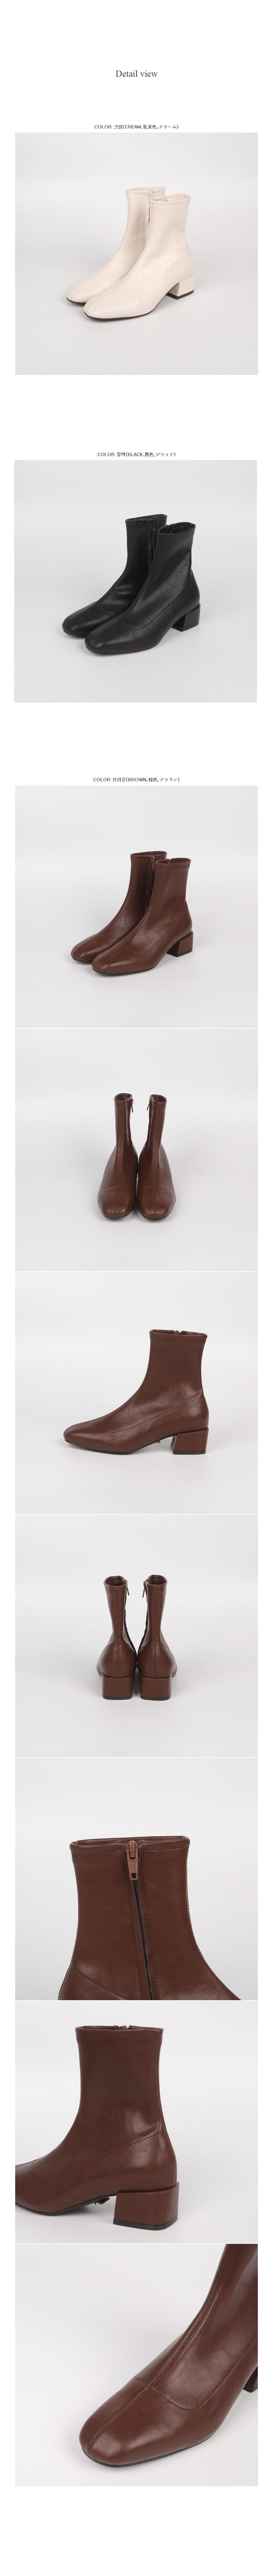 Orbene shoes